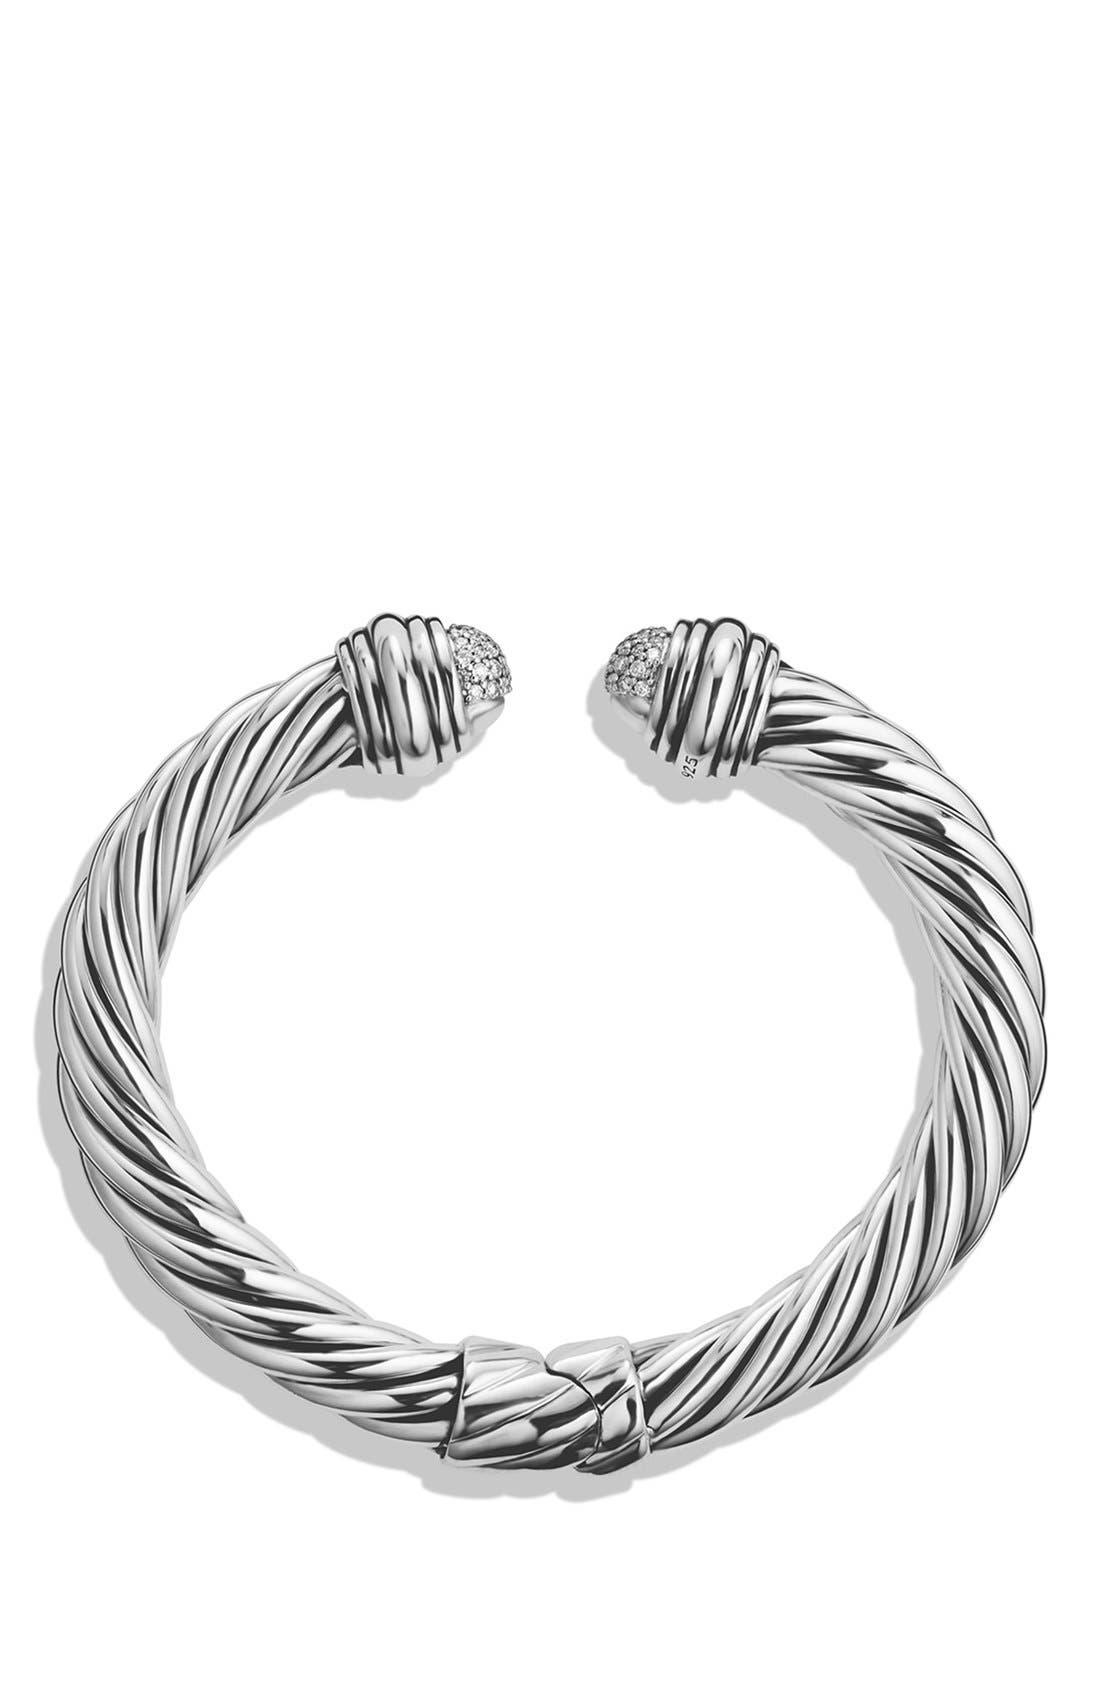 Alternate Image 2  - David Yurman 'Cable Classics' Pavé Tip Bracelet with Diamonds